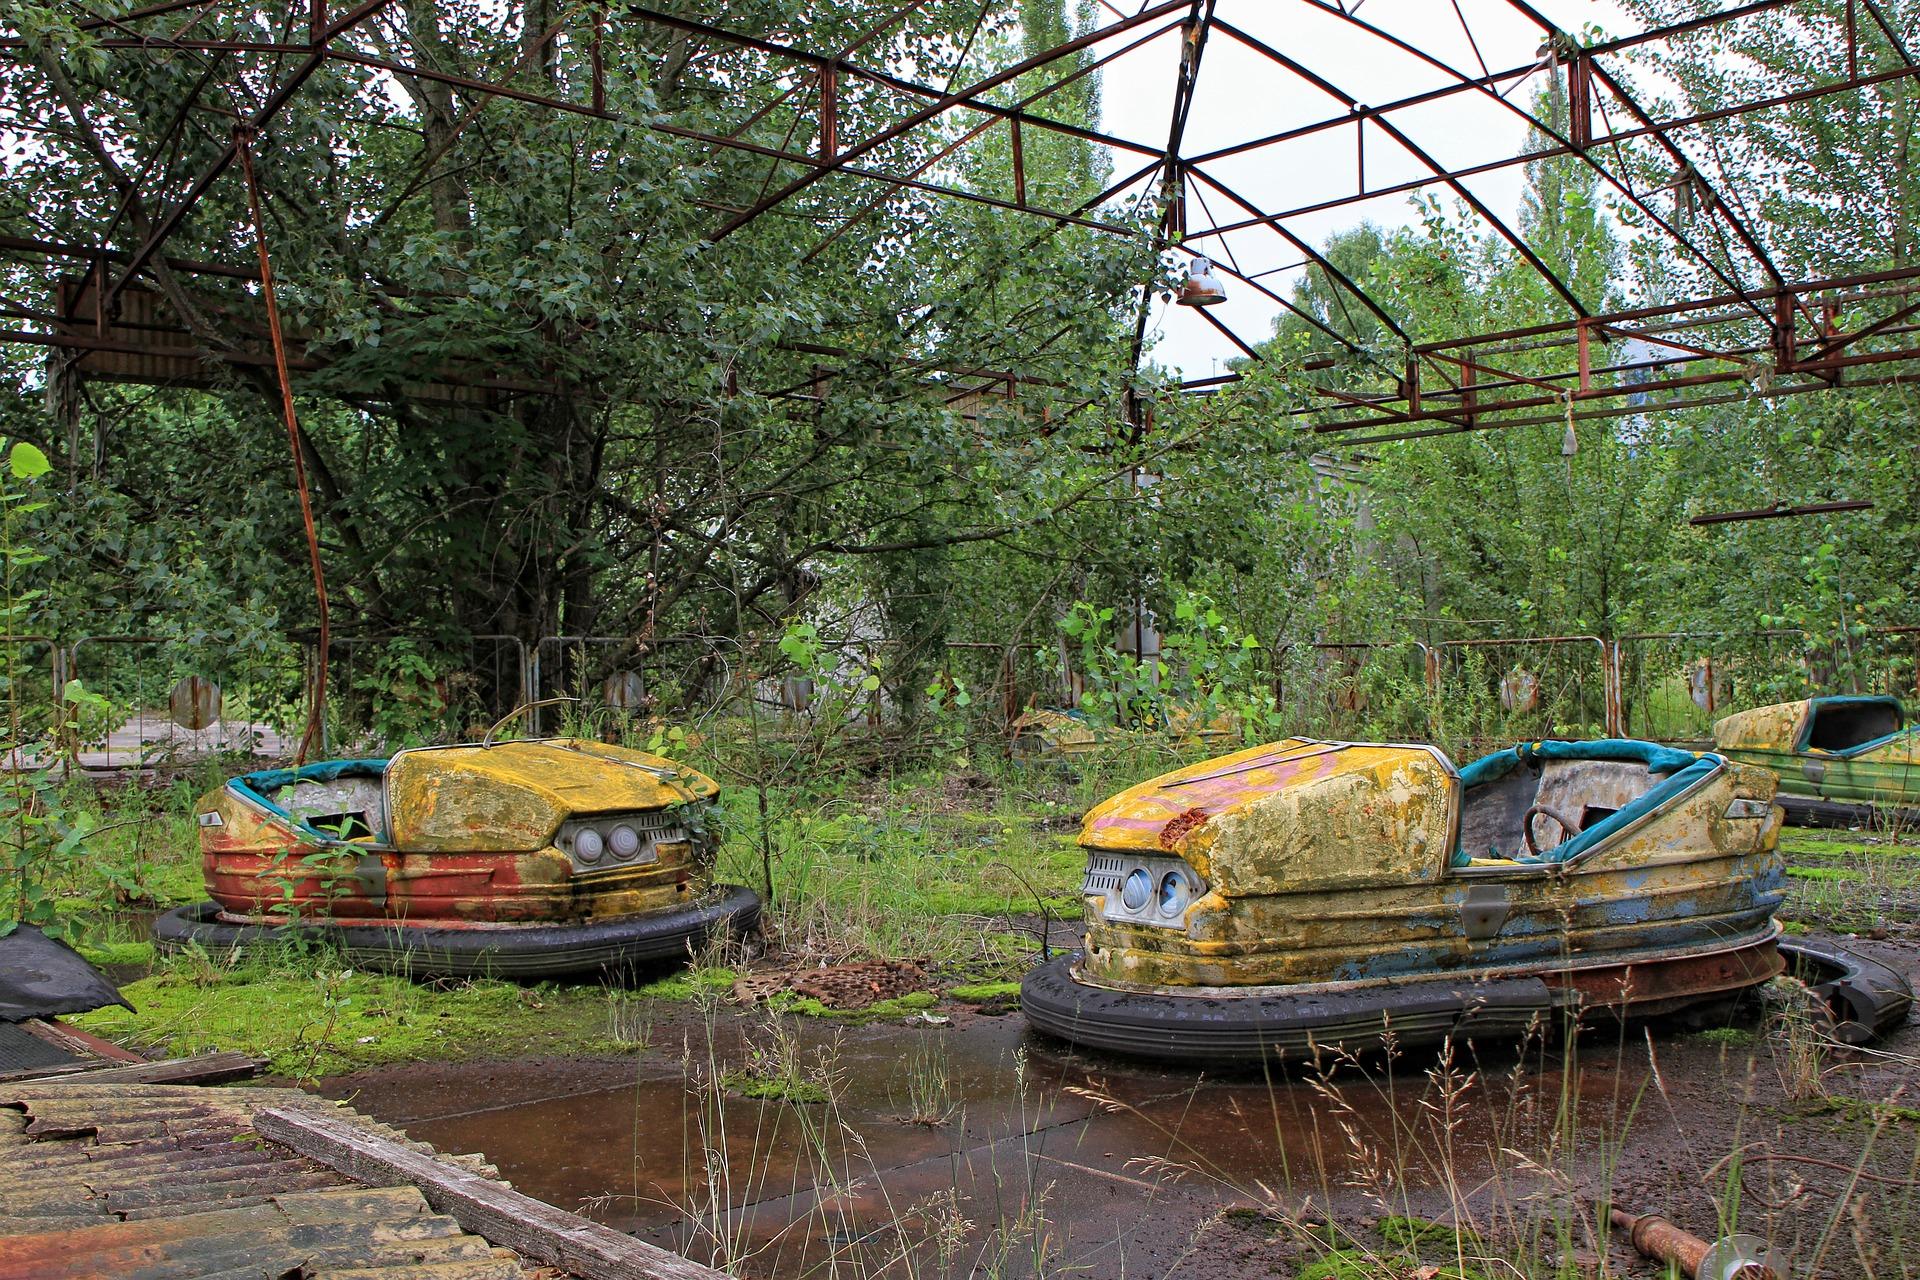 Cernobyl - 30 anni dopo